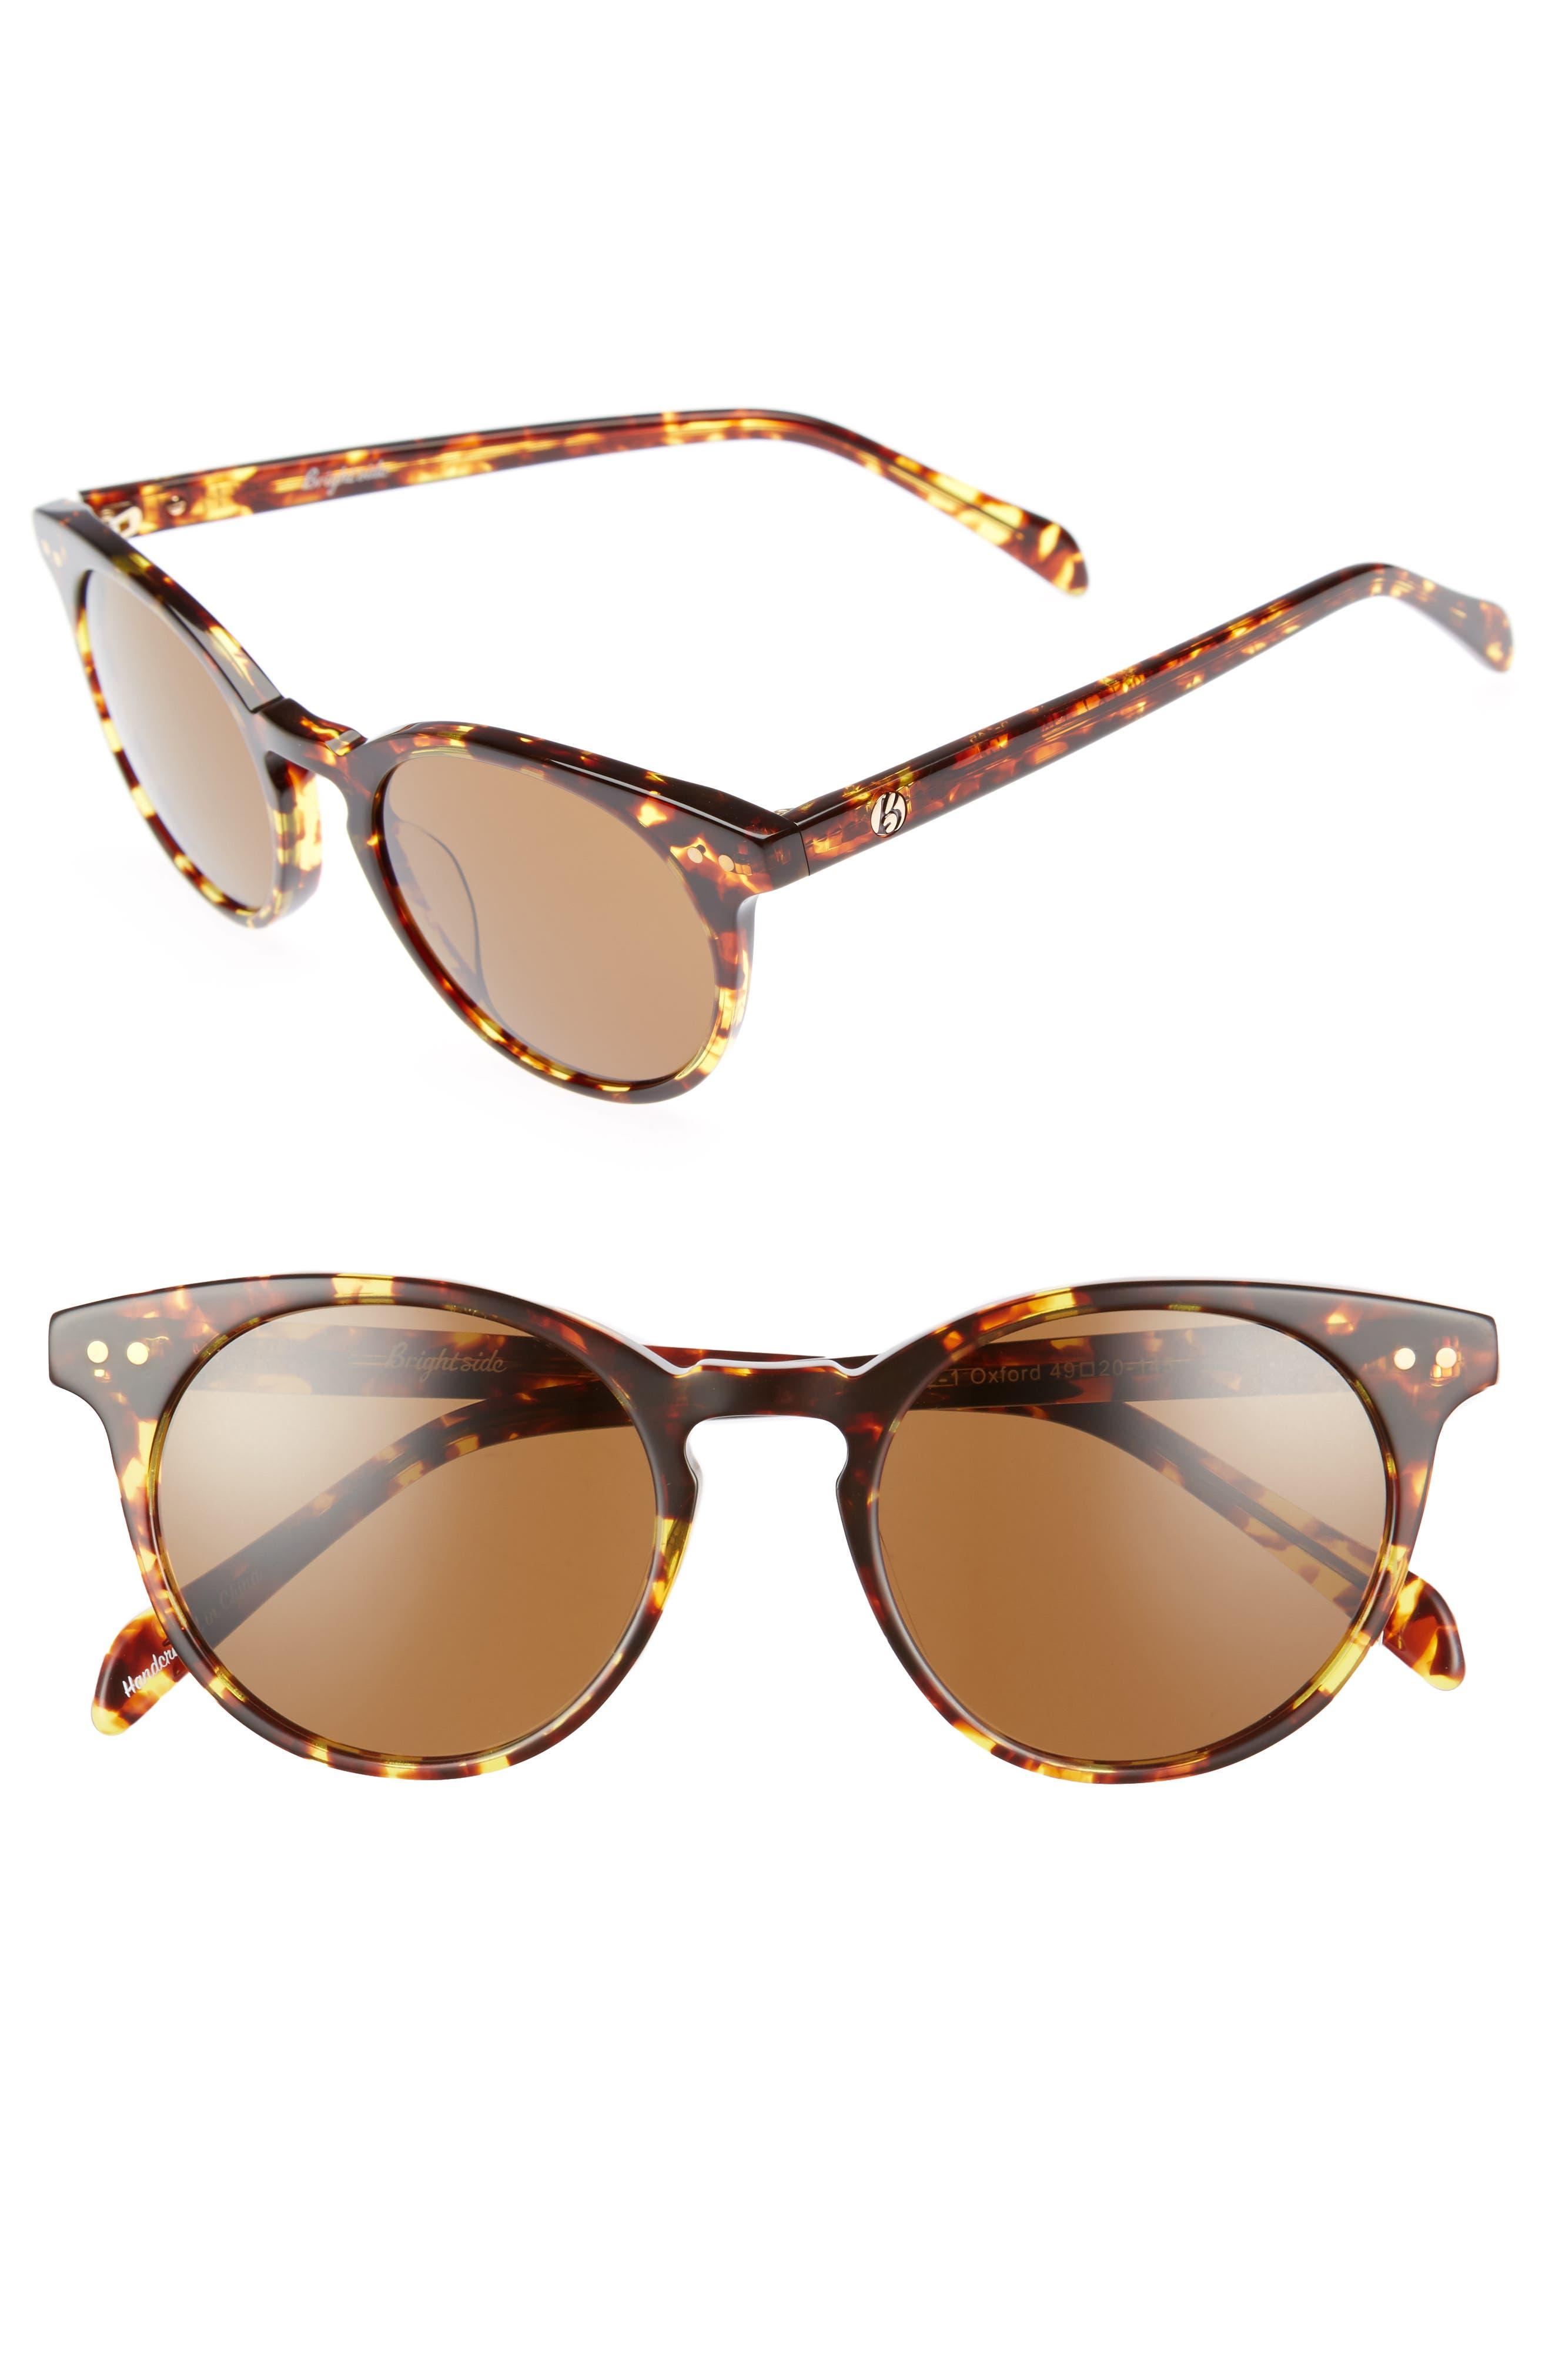 Oxford 49mm Sunglasses,                         Main,                         color, Classic Tortoise/ Brown